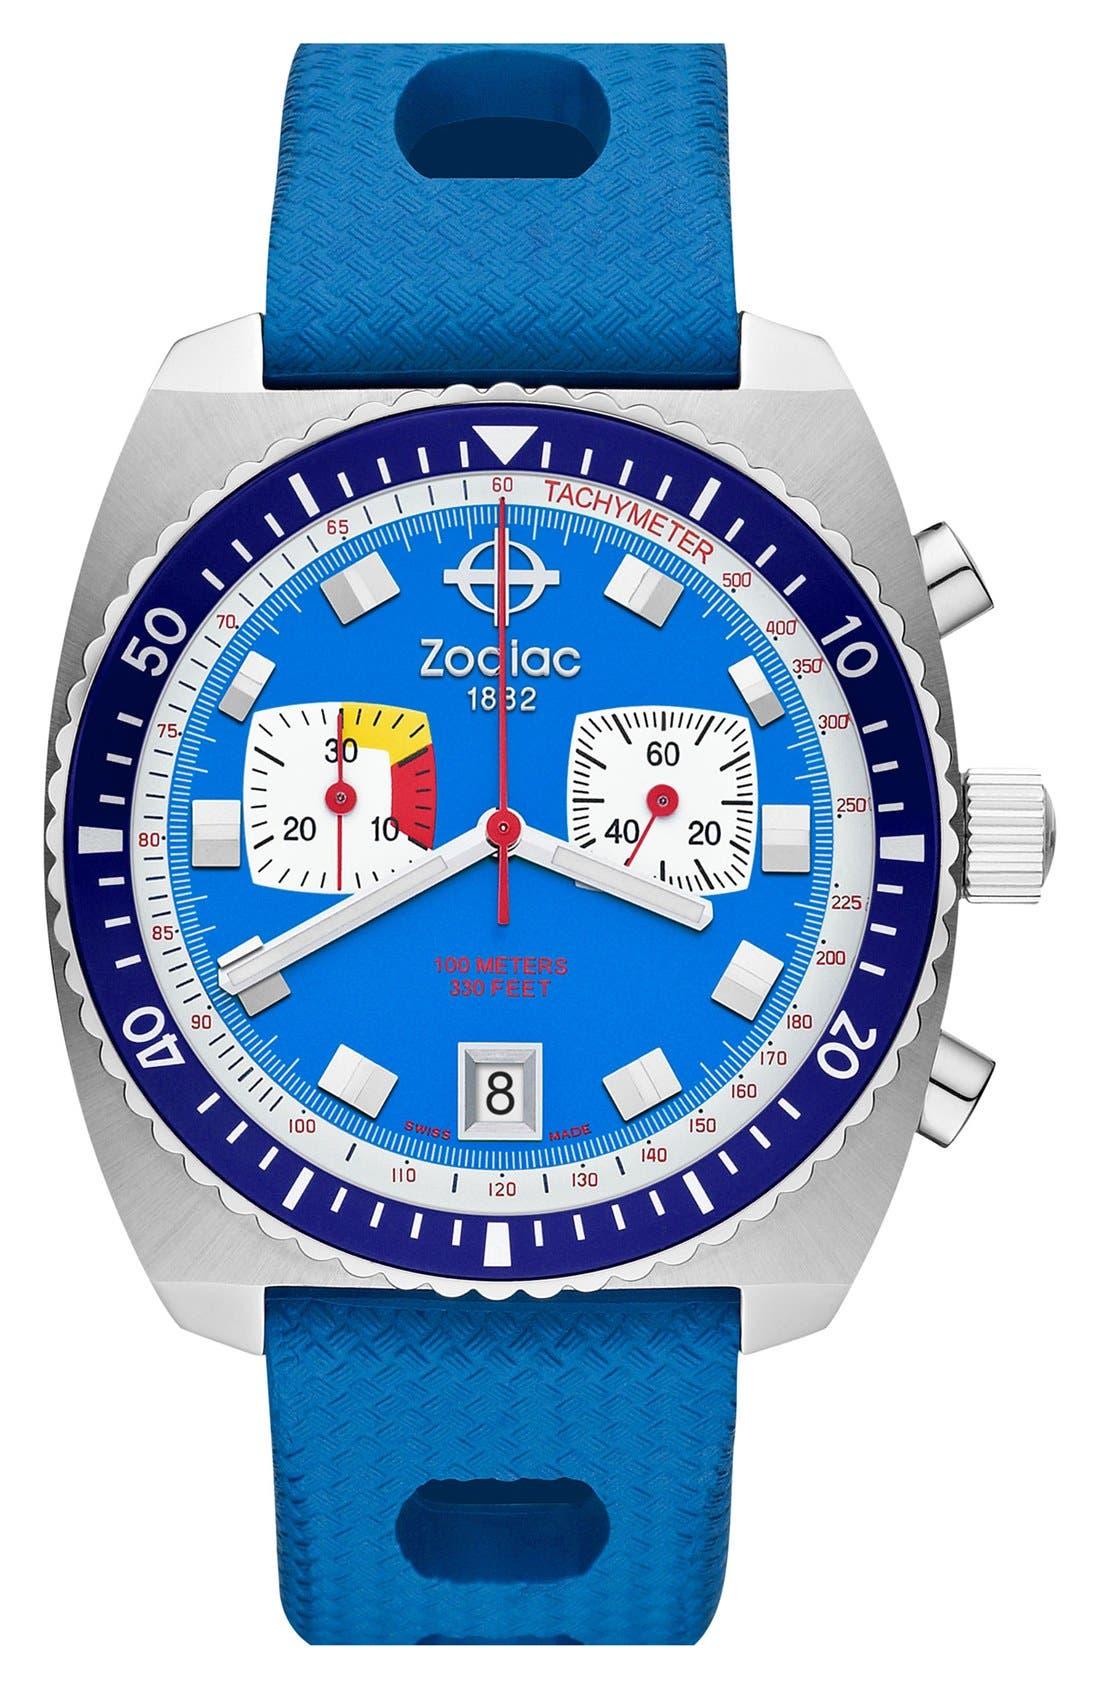 Main Image - Zodiac 'Sea Dragon' Chronograph Rubber Strap Watch, 42mm